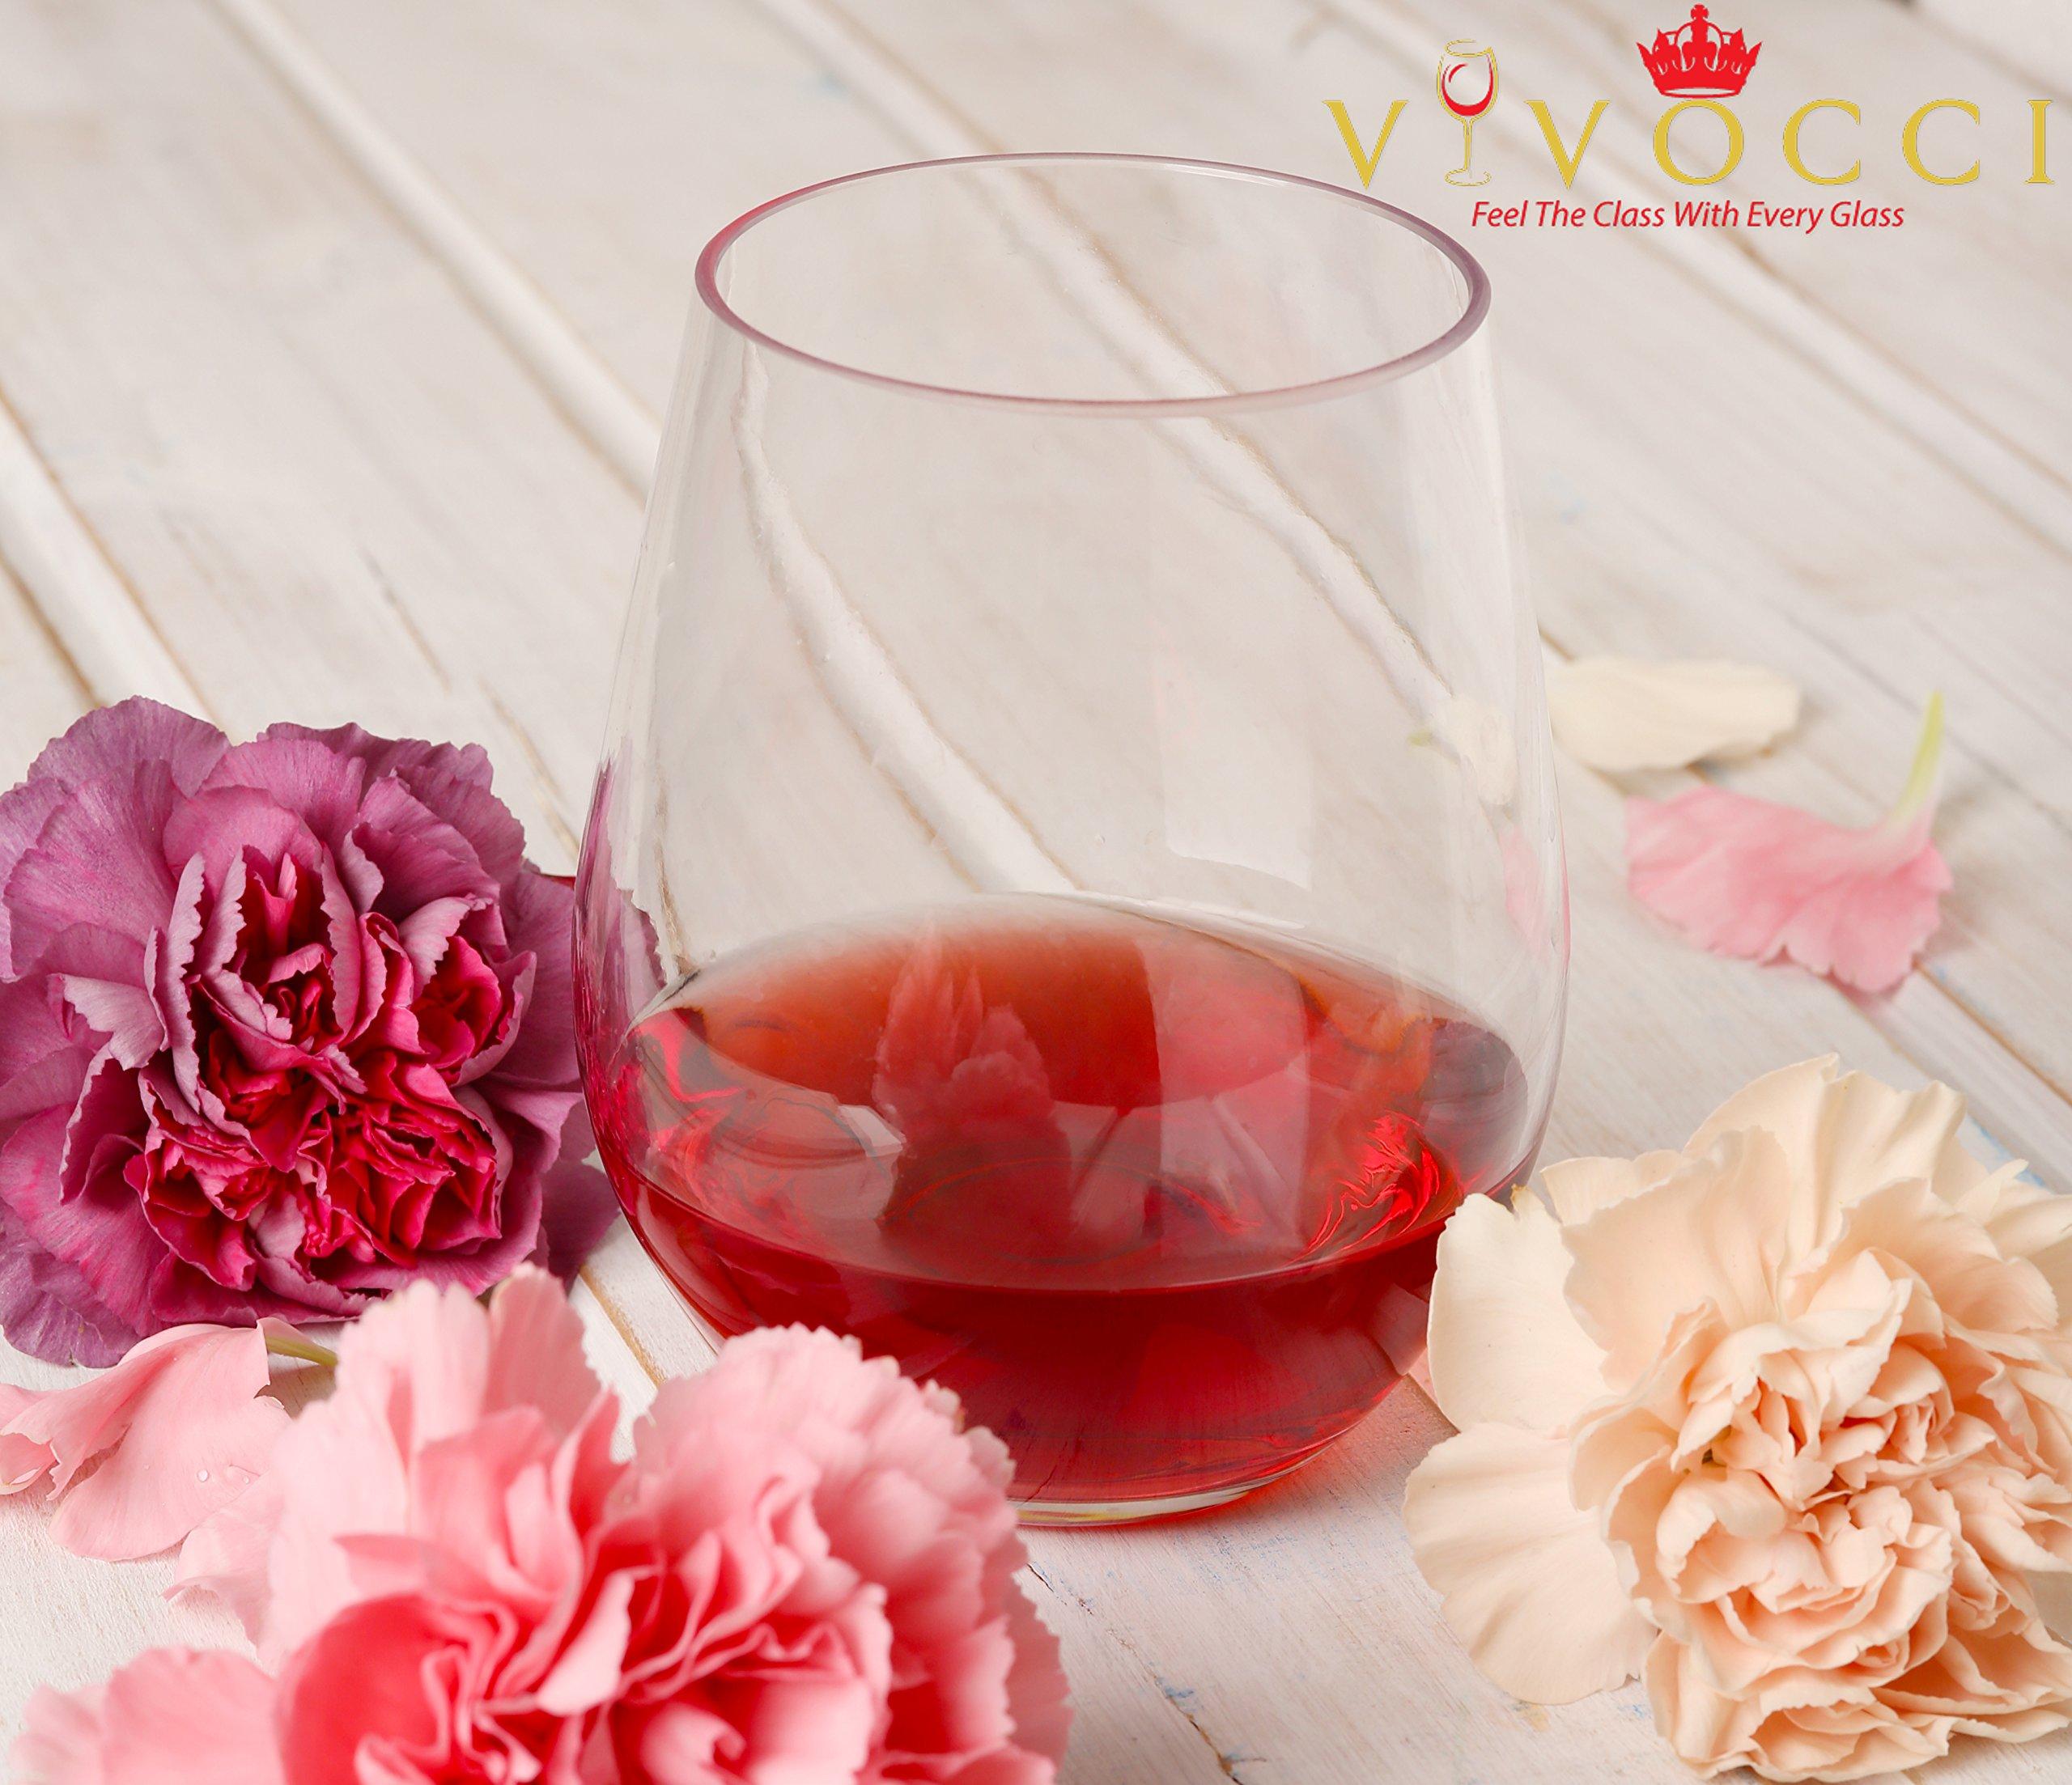 Vivocci Unbreakable Elegant Plastic Stemless Wine Glasses 20 oz | 100% Tritan Heavy Base | Shatterproof Glassware | Ideal For Cocktails & Scotch | Perfect For Homes & Bars | Dishwasher Safe | Set of 2 by Vivocci (Image #9)